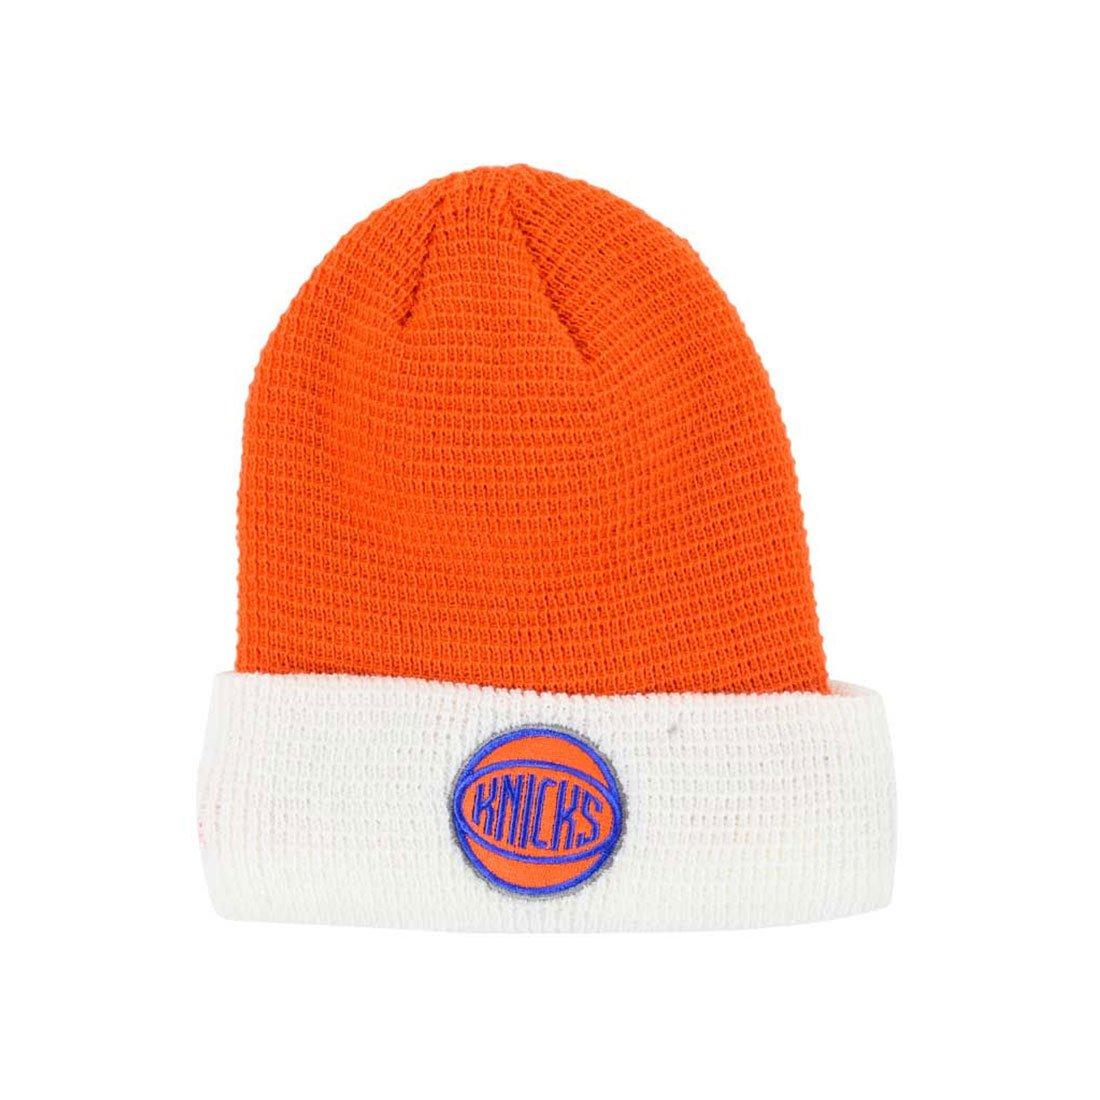 63cd7acc7 Adidas NBA New York Knicks Team Cuffed Knit Beanie (orange / white ...